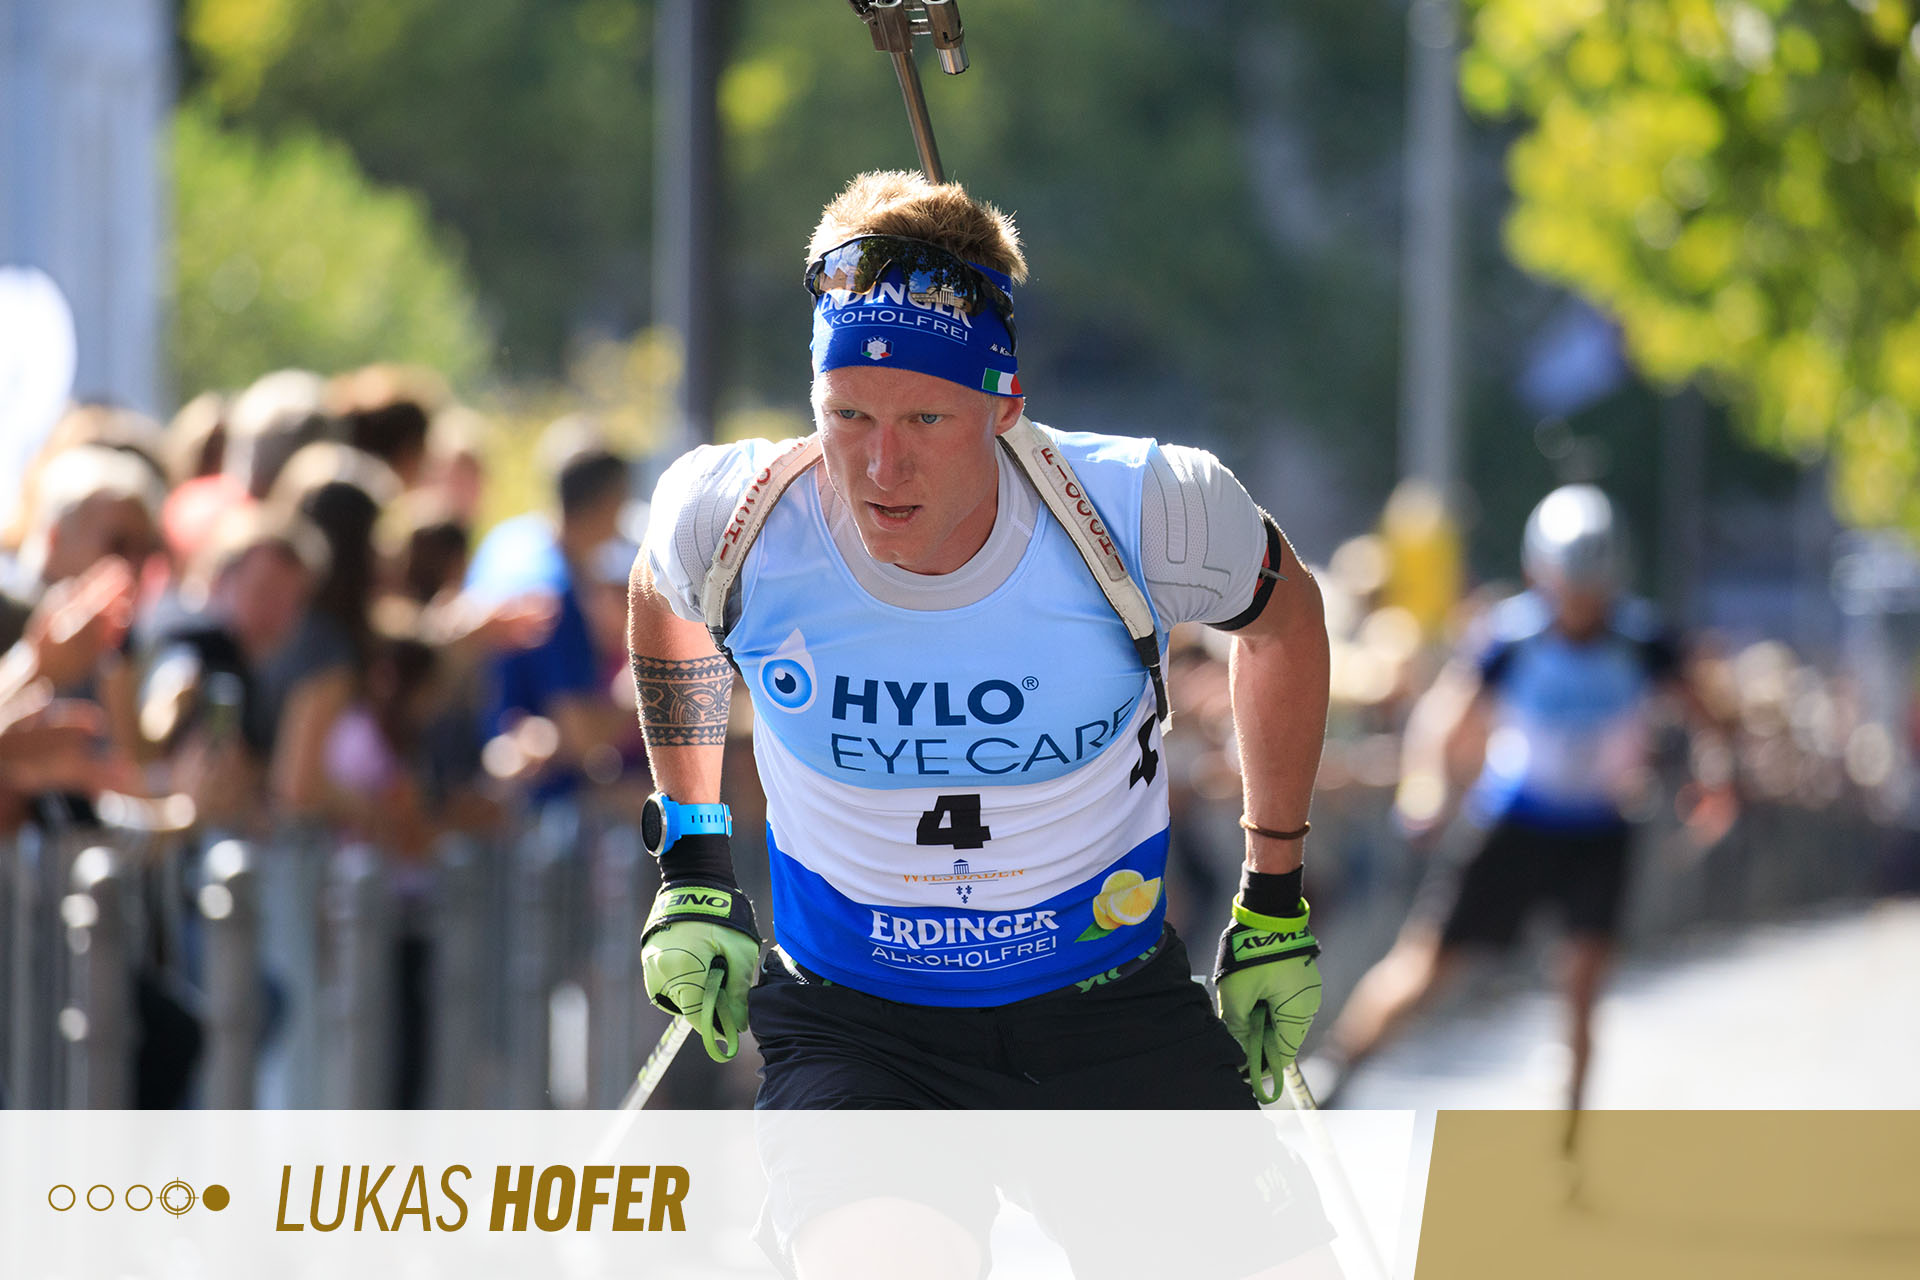 Athleten_LukasHofer